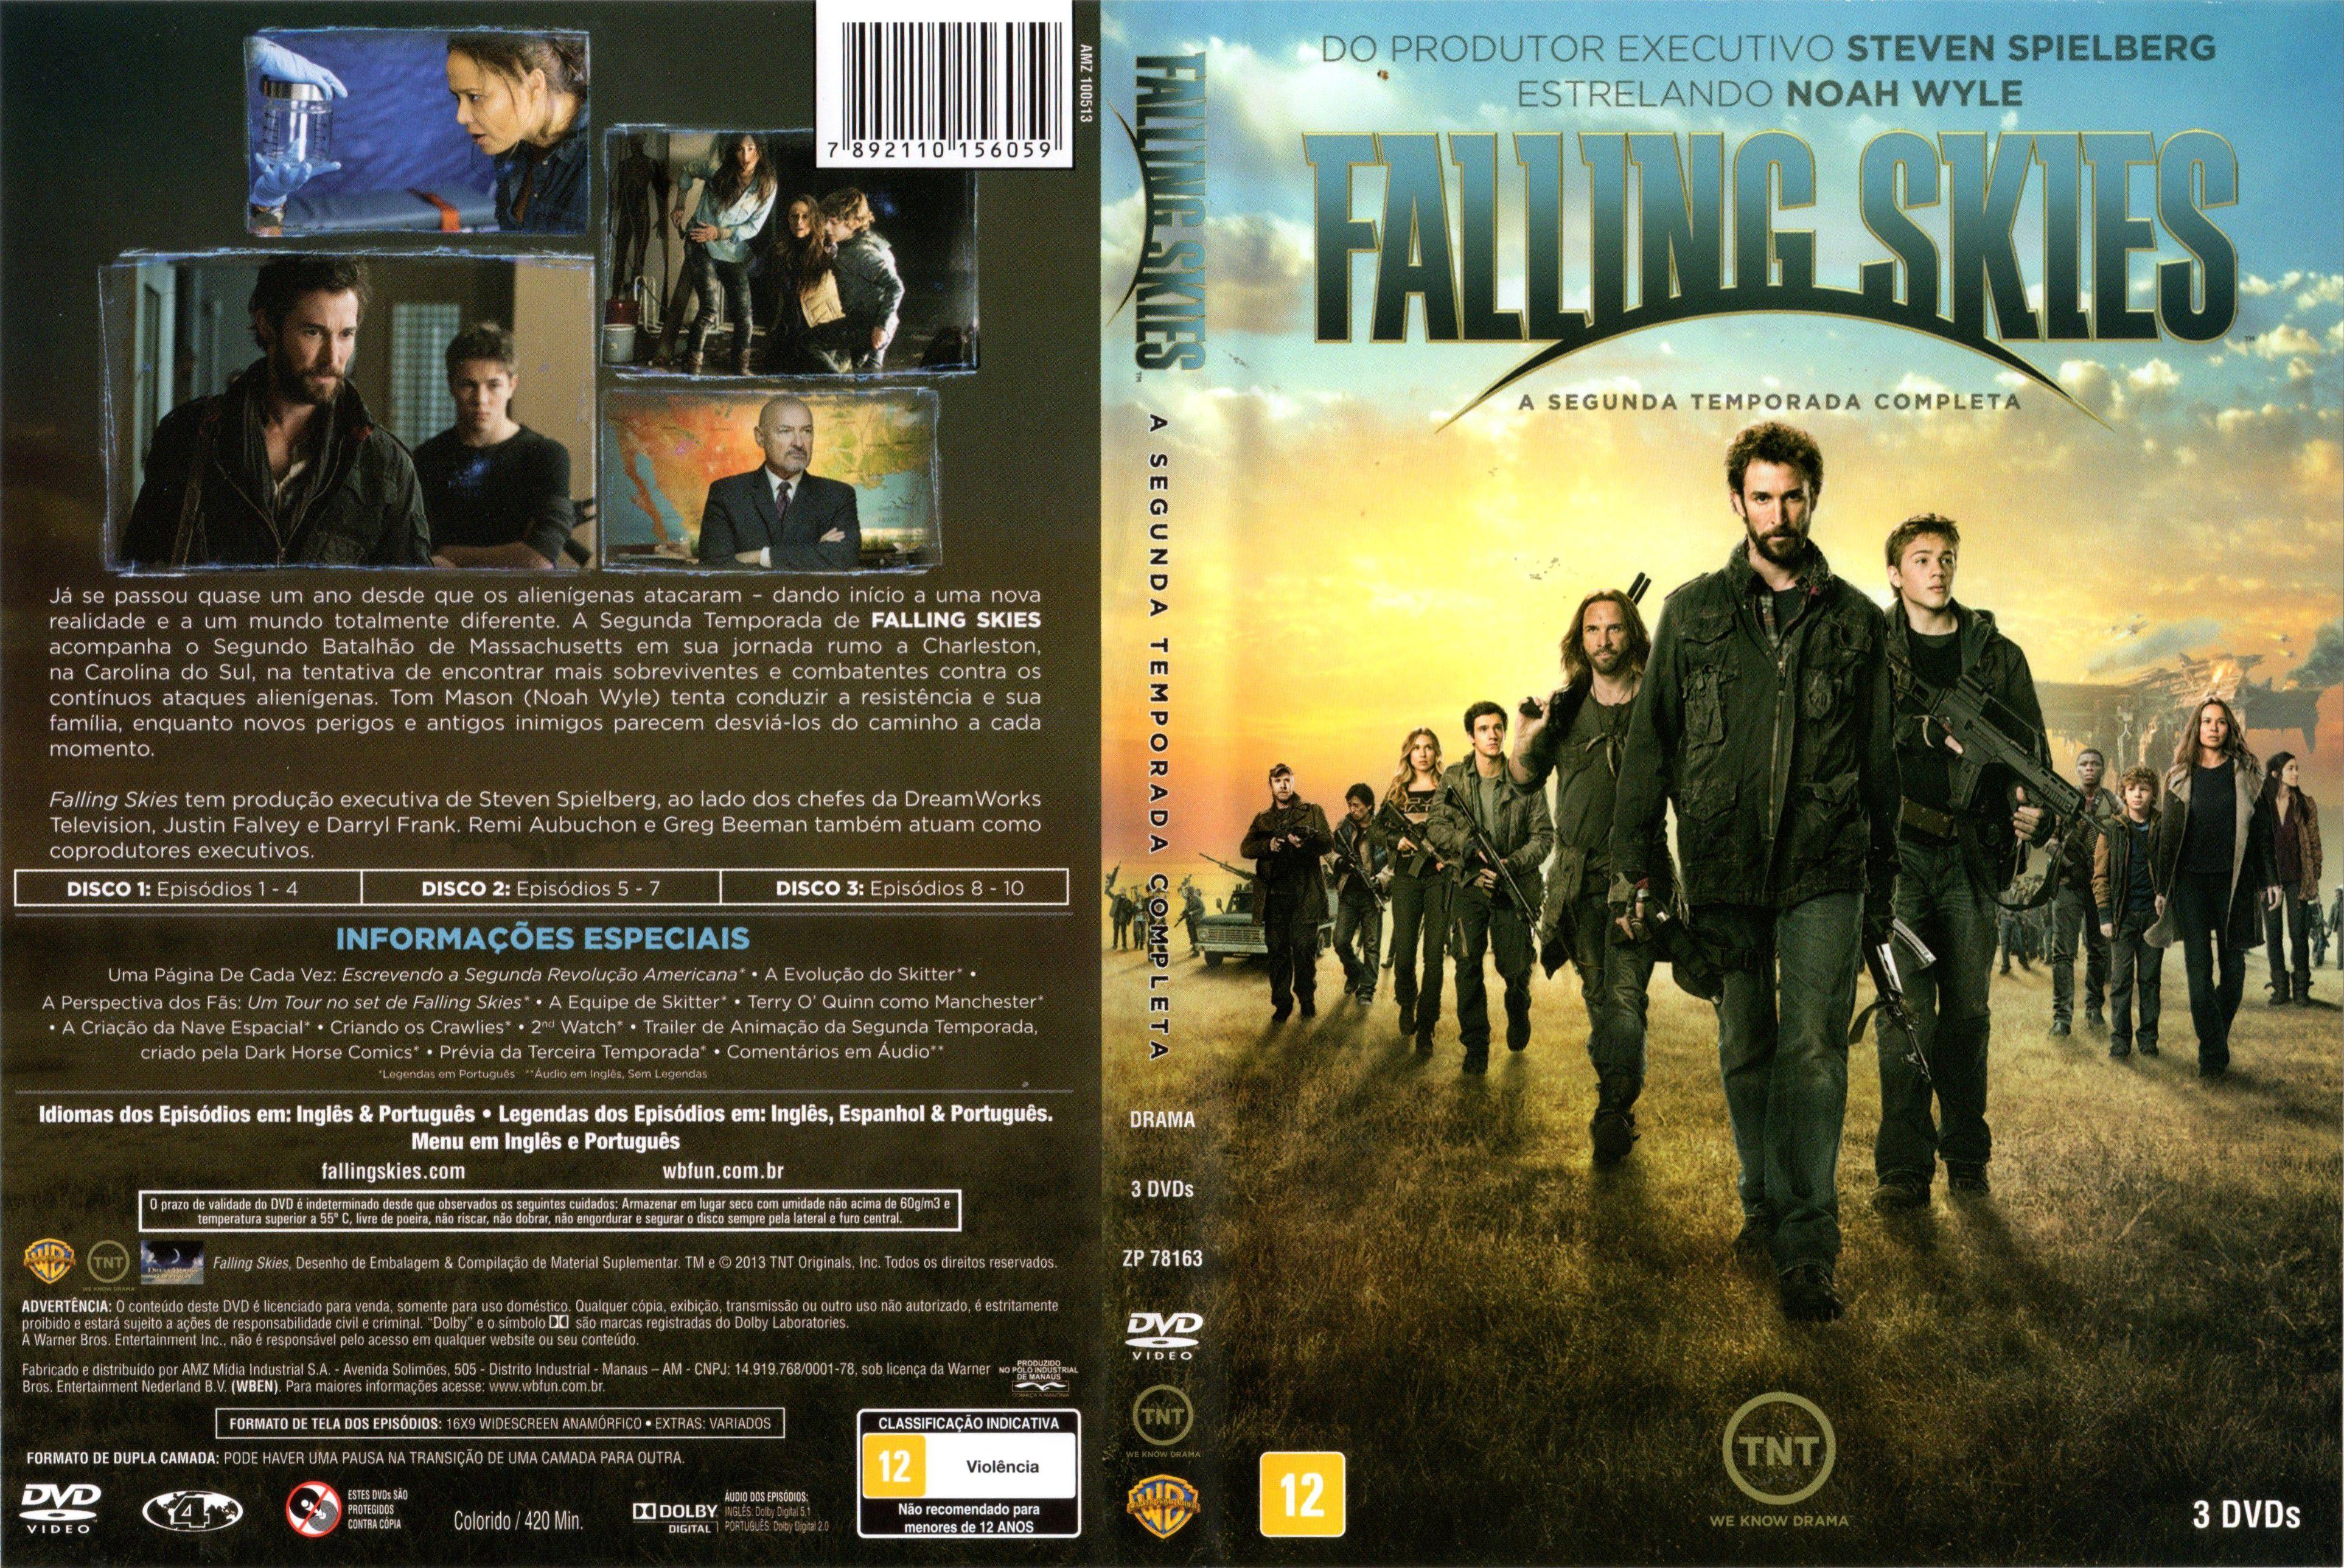 Capa DVD Falling Skies 2ª Temporada Completa - Gamecover | Capas ...